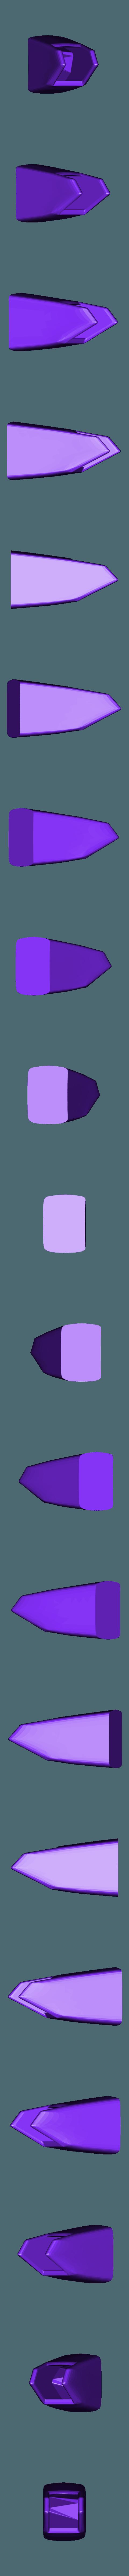 Pierna_Der_II.STL Download STL file VF1 • 3D print design, Nico_3D